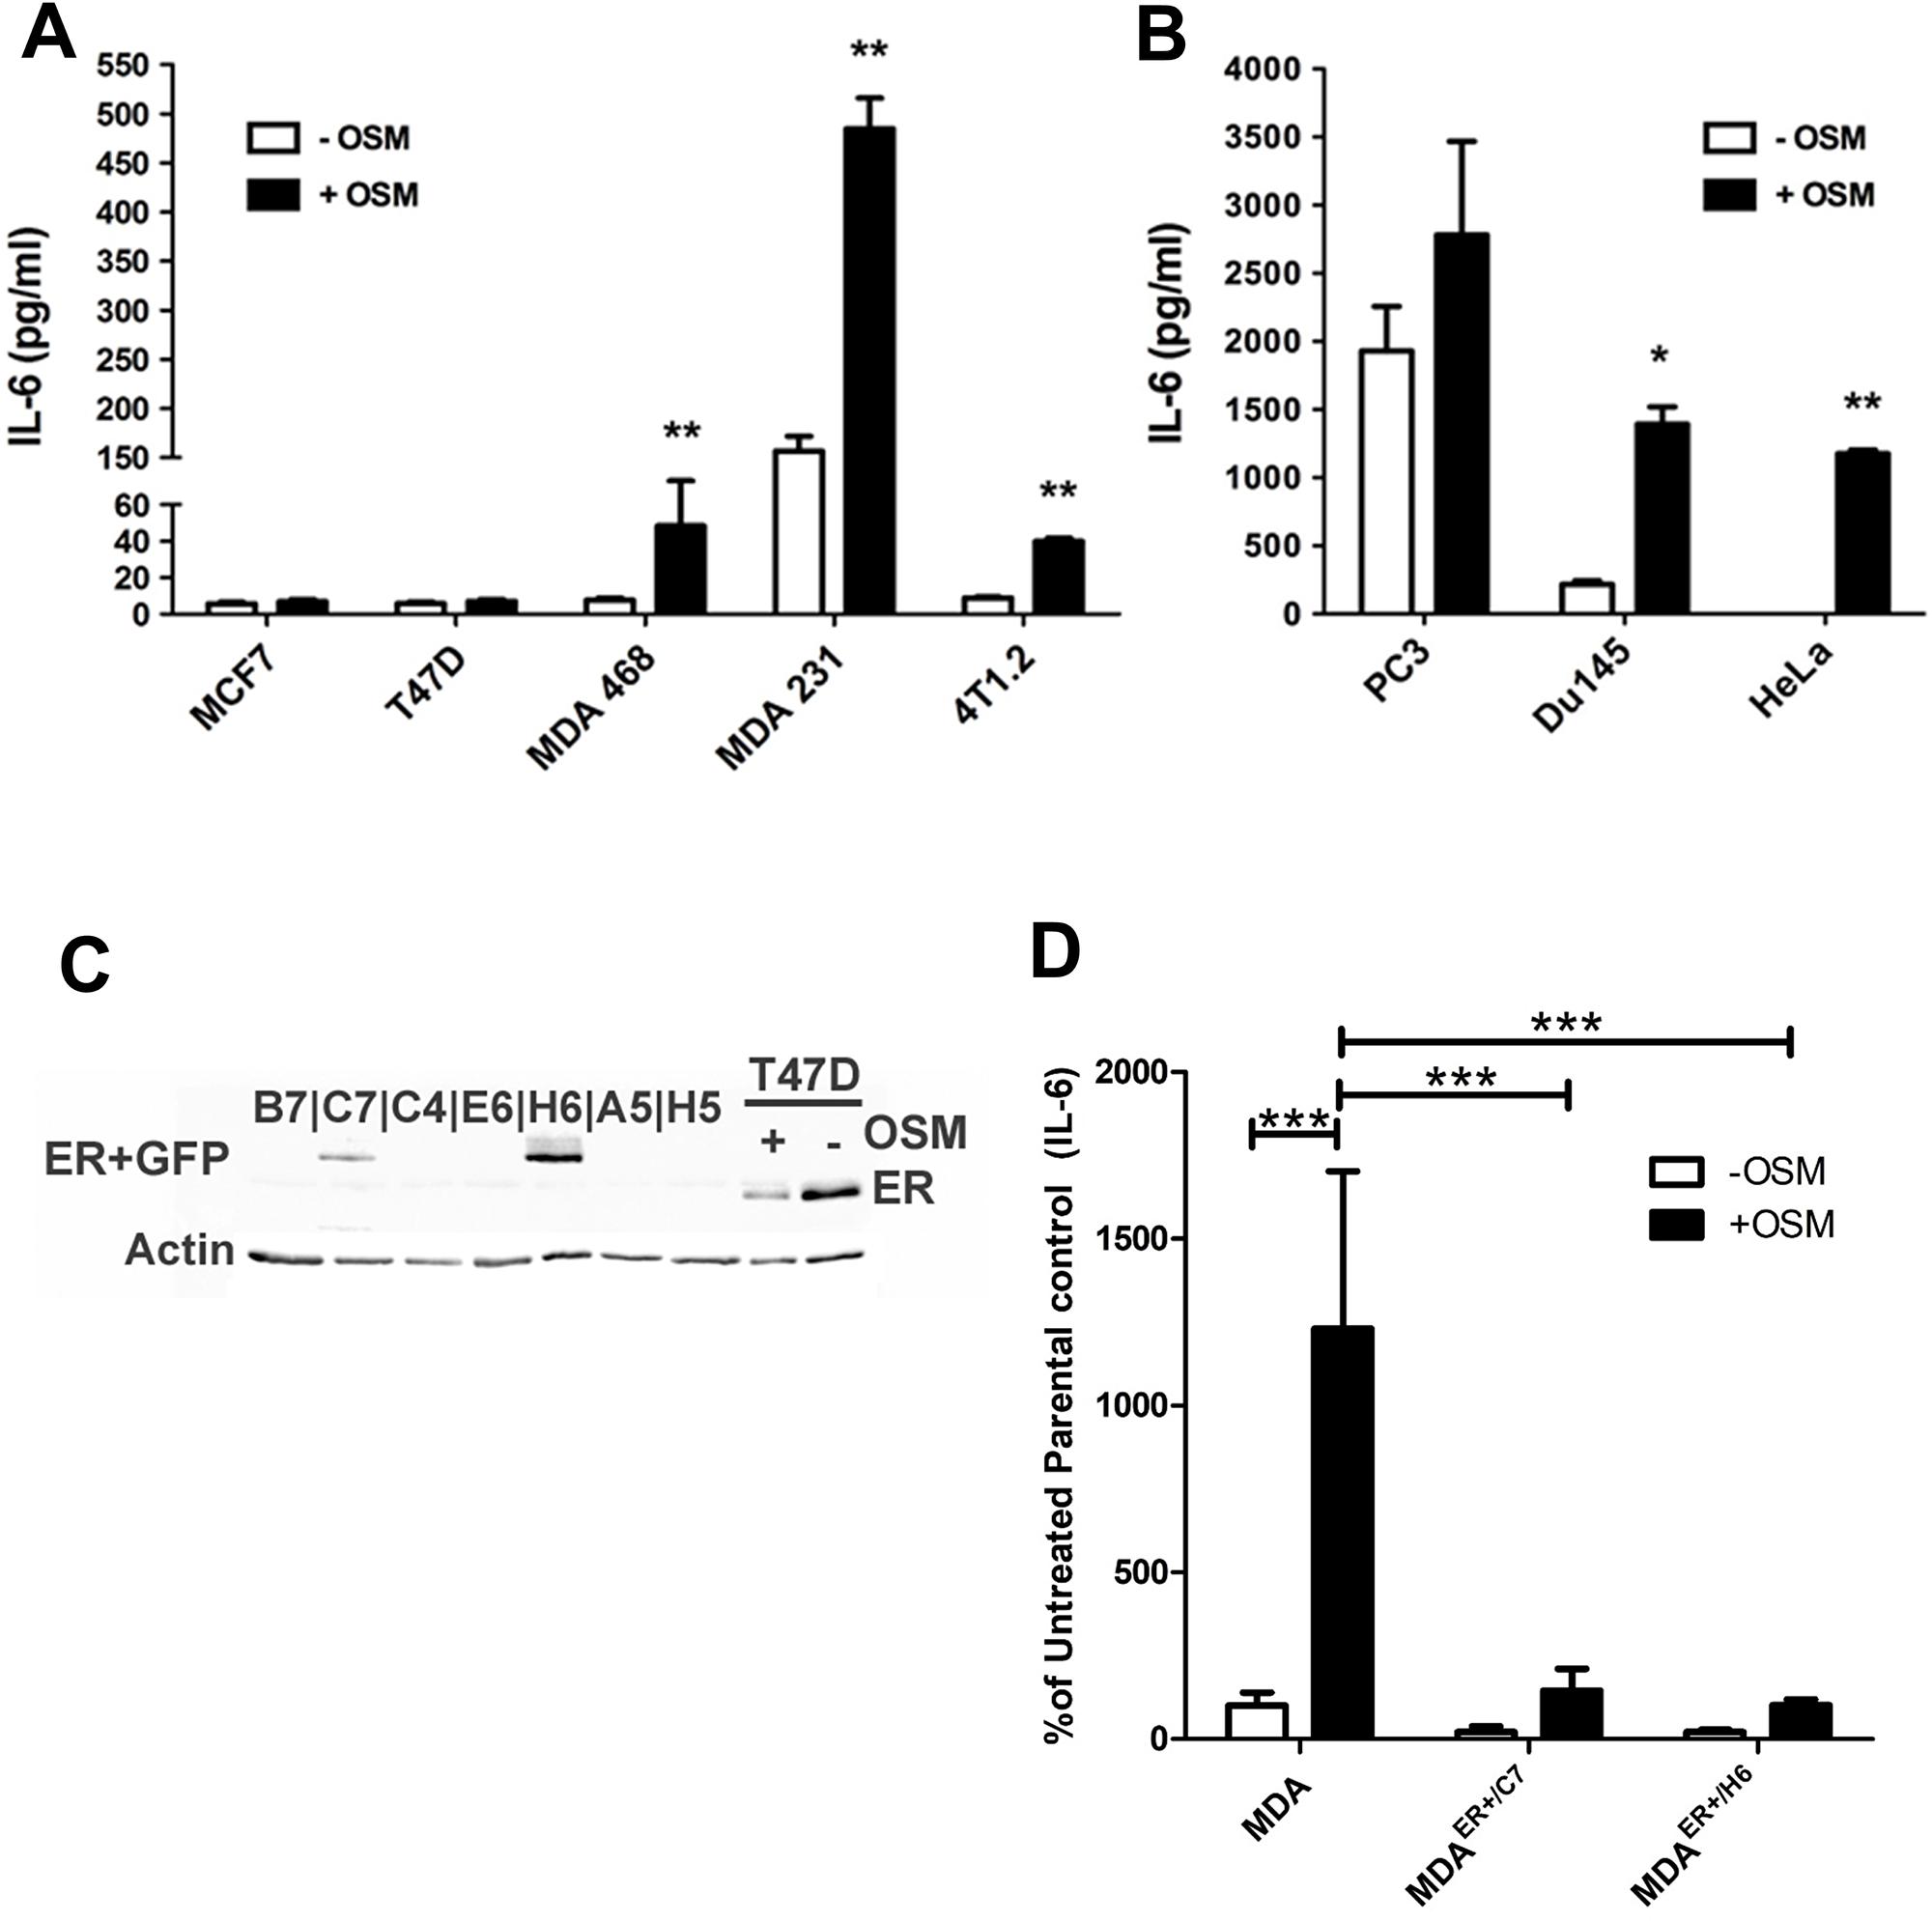 OSM induces IL-6 secretion in an ER-dependent manner.